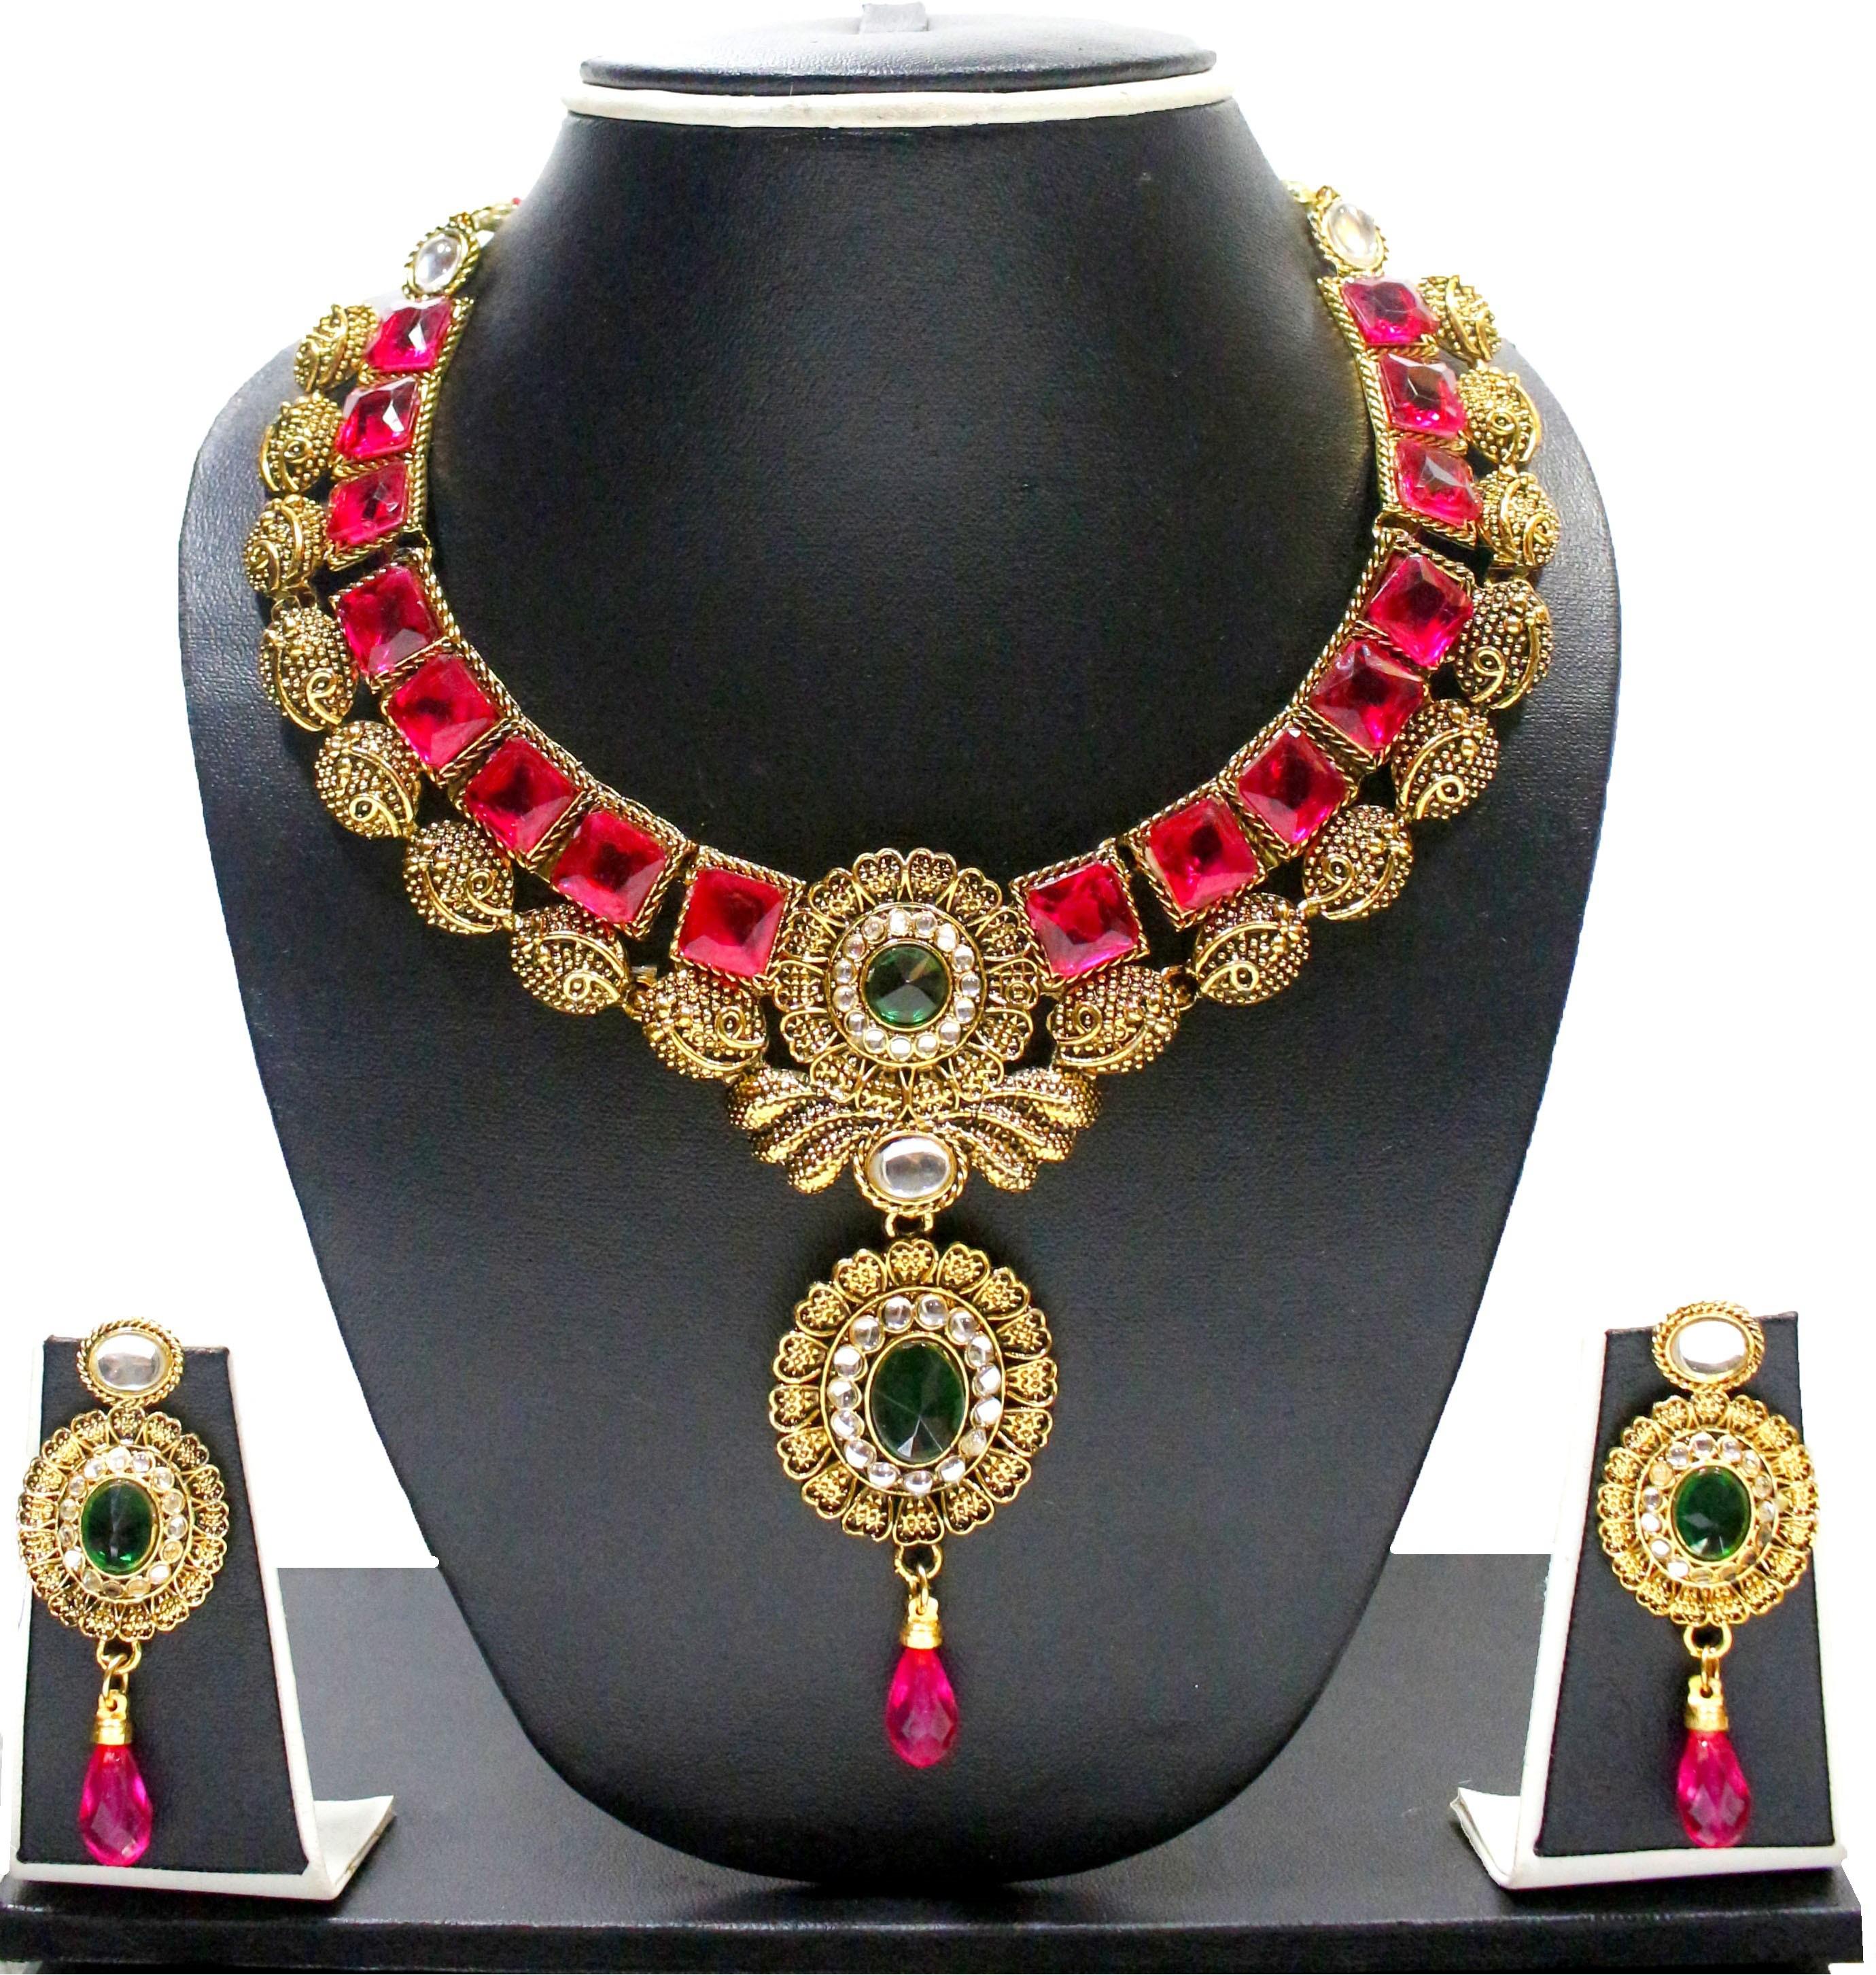 Deals - Delhi - Best Collection <br> Earrings, Sets, Rings..<br> Category - jewellery<br> Business - Flipkart.com